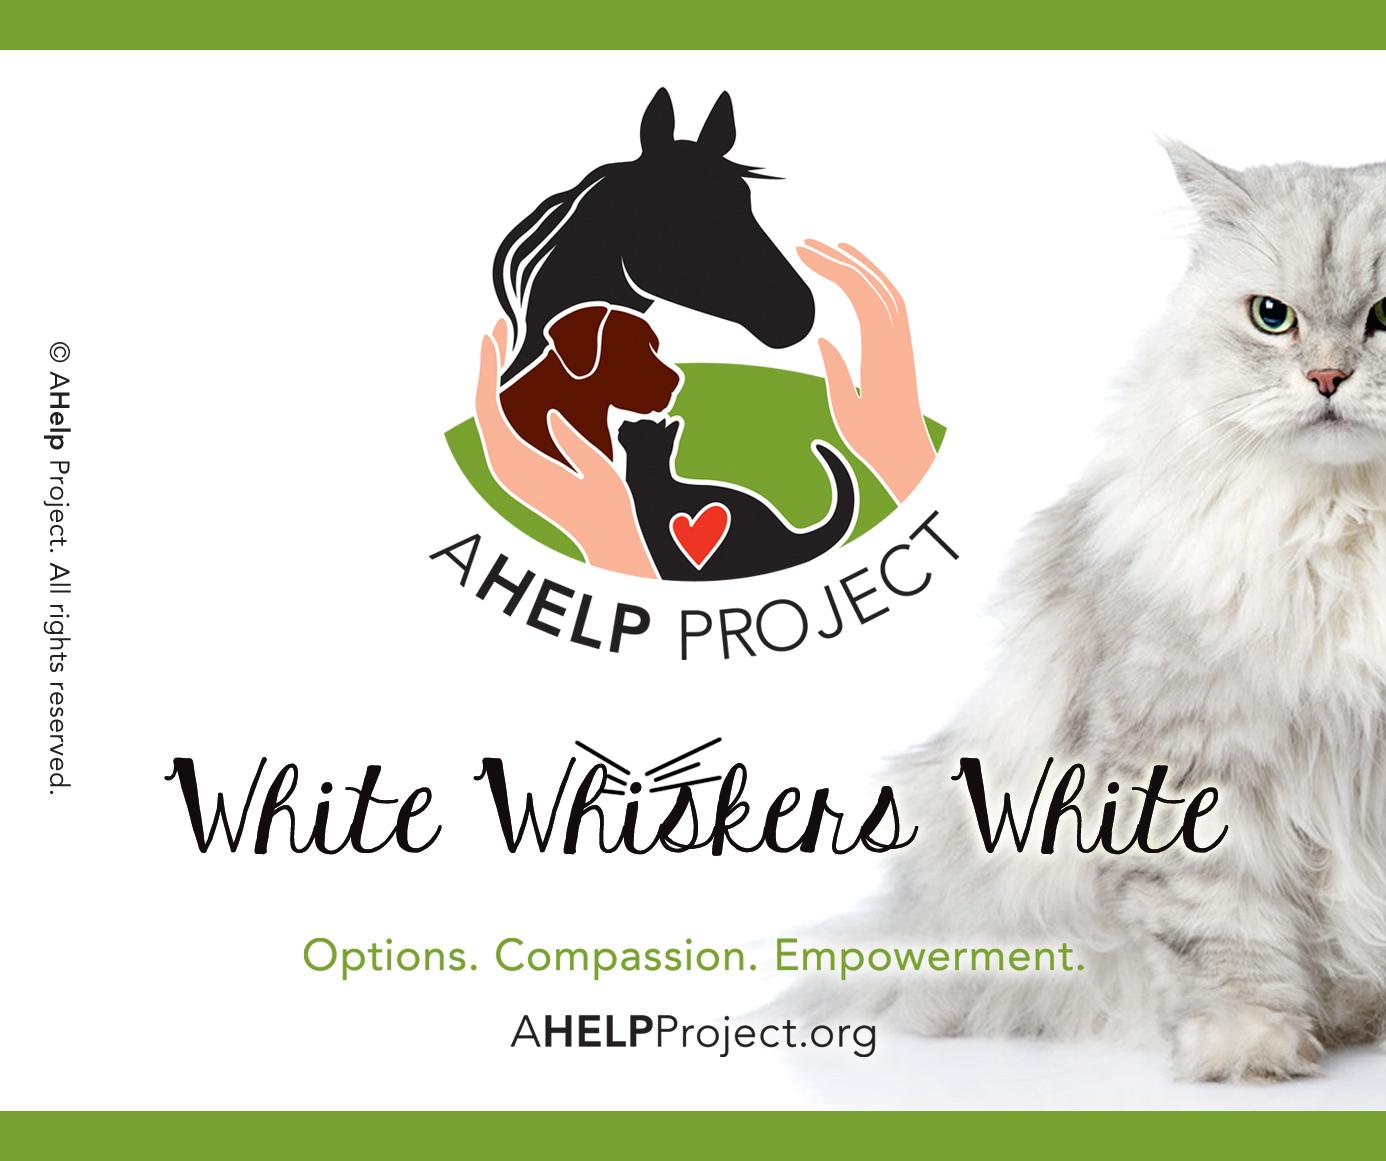 NWC_horizontal_AHelpLabel_White.jpg